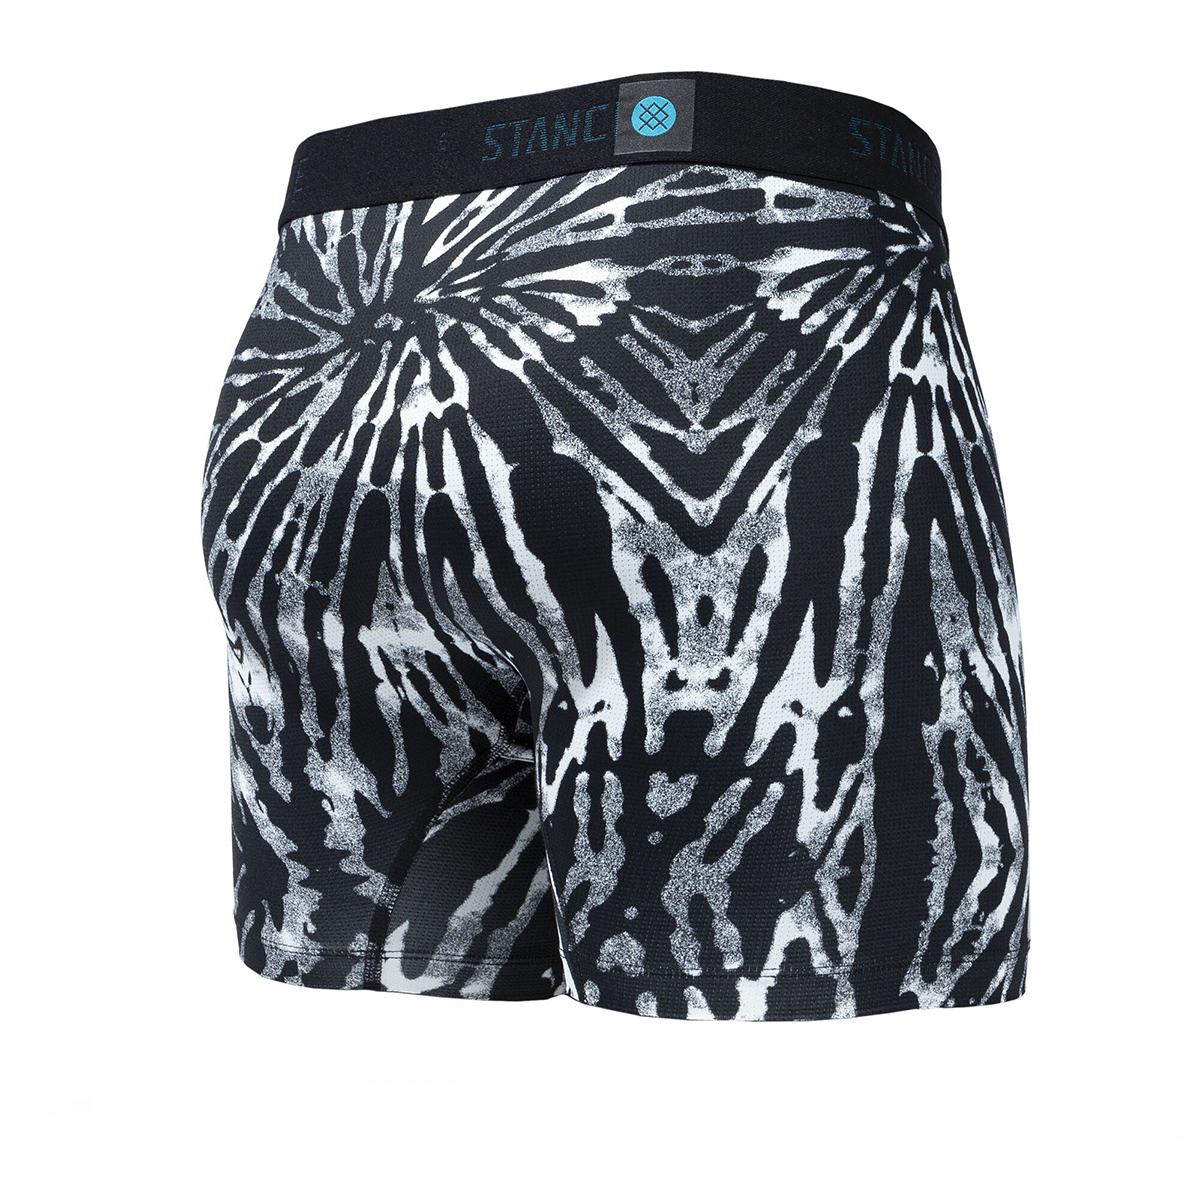 Men's Stance Helquist Boxer Brief Wholester - Color: Black/Grey - Size: S, Black/Grey, large, image 2